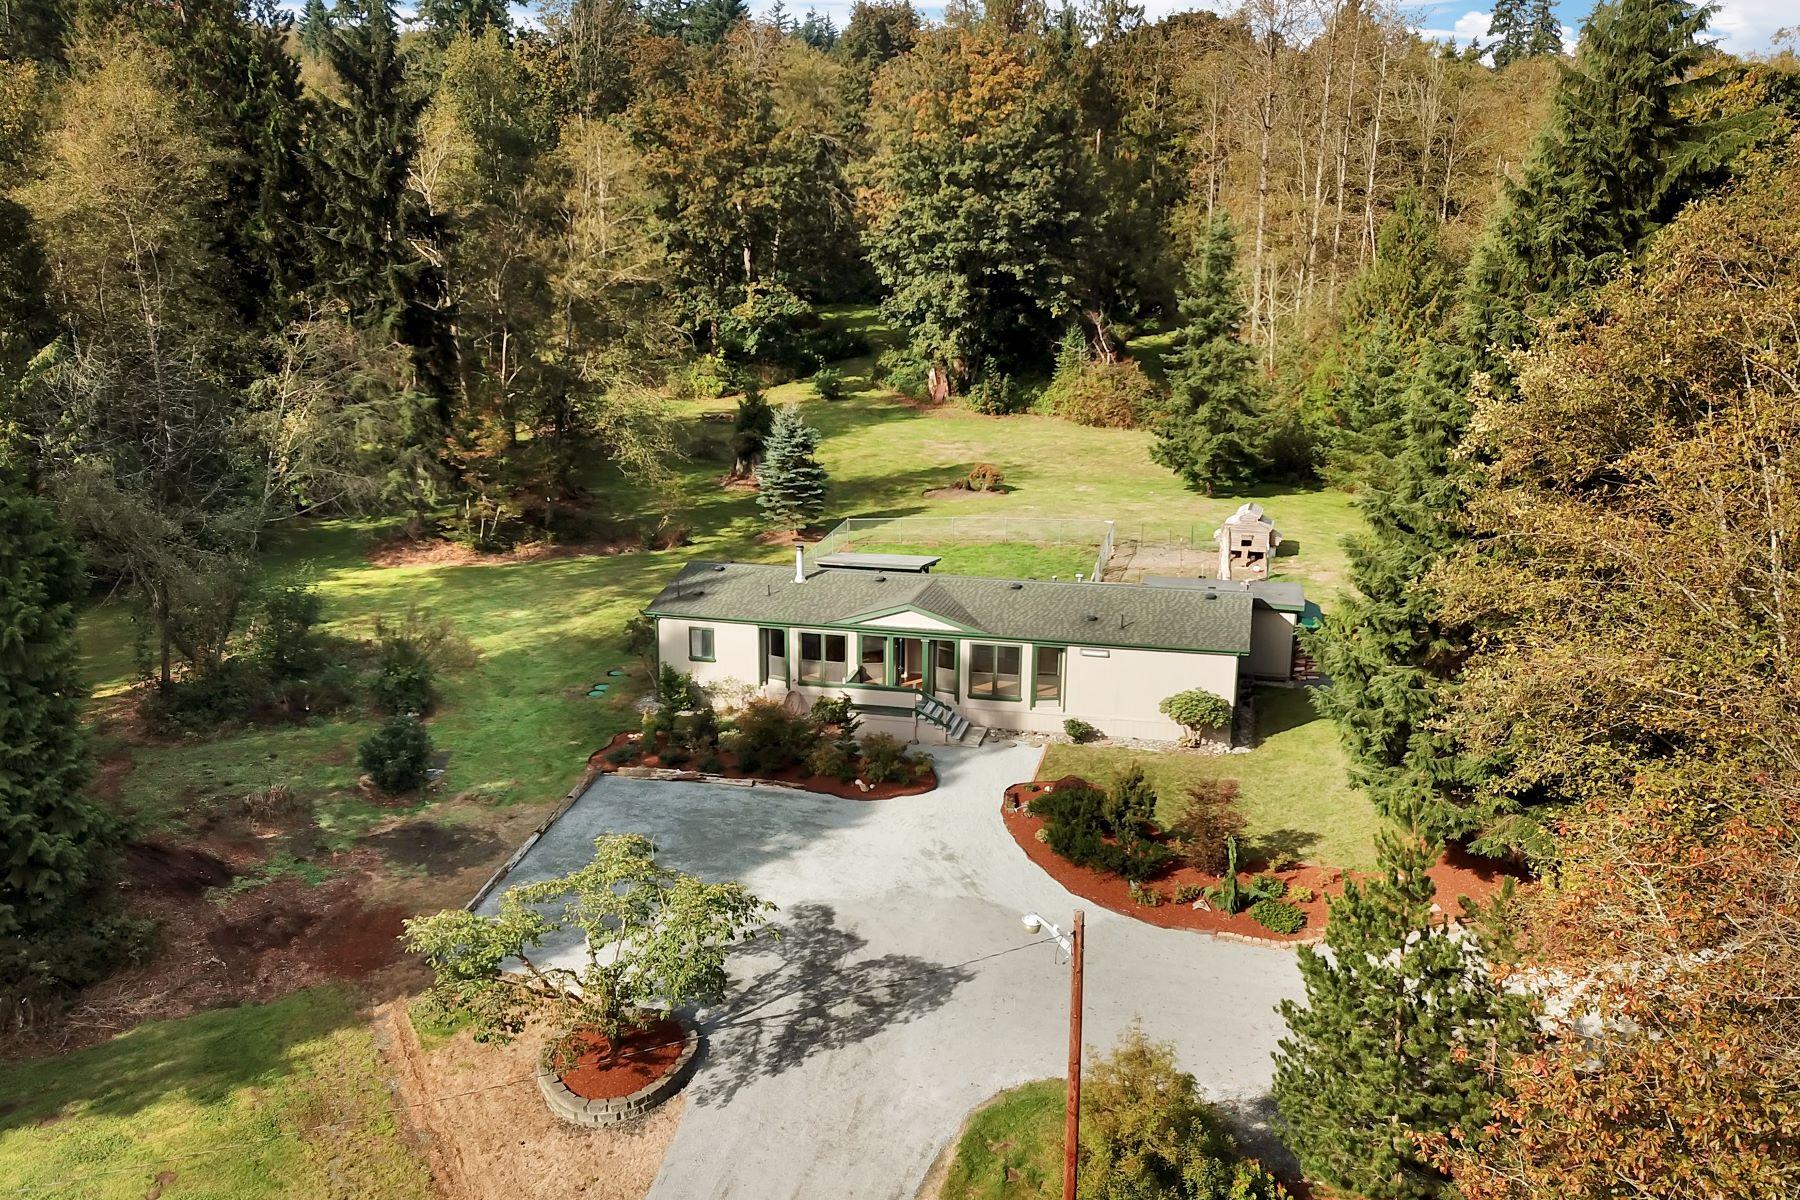 Single Family Homes for Sale at Serenity 14710 2nd Ave NE Marysville, Washington 98271 United States